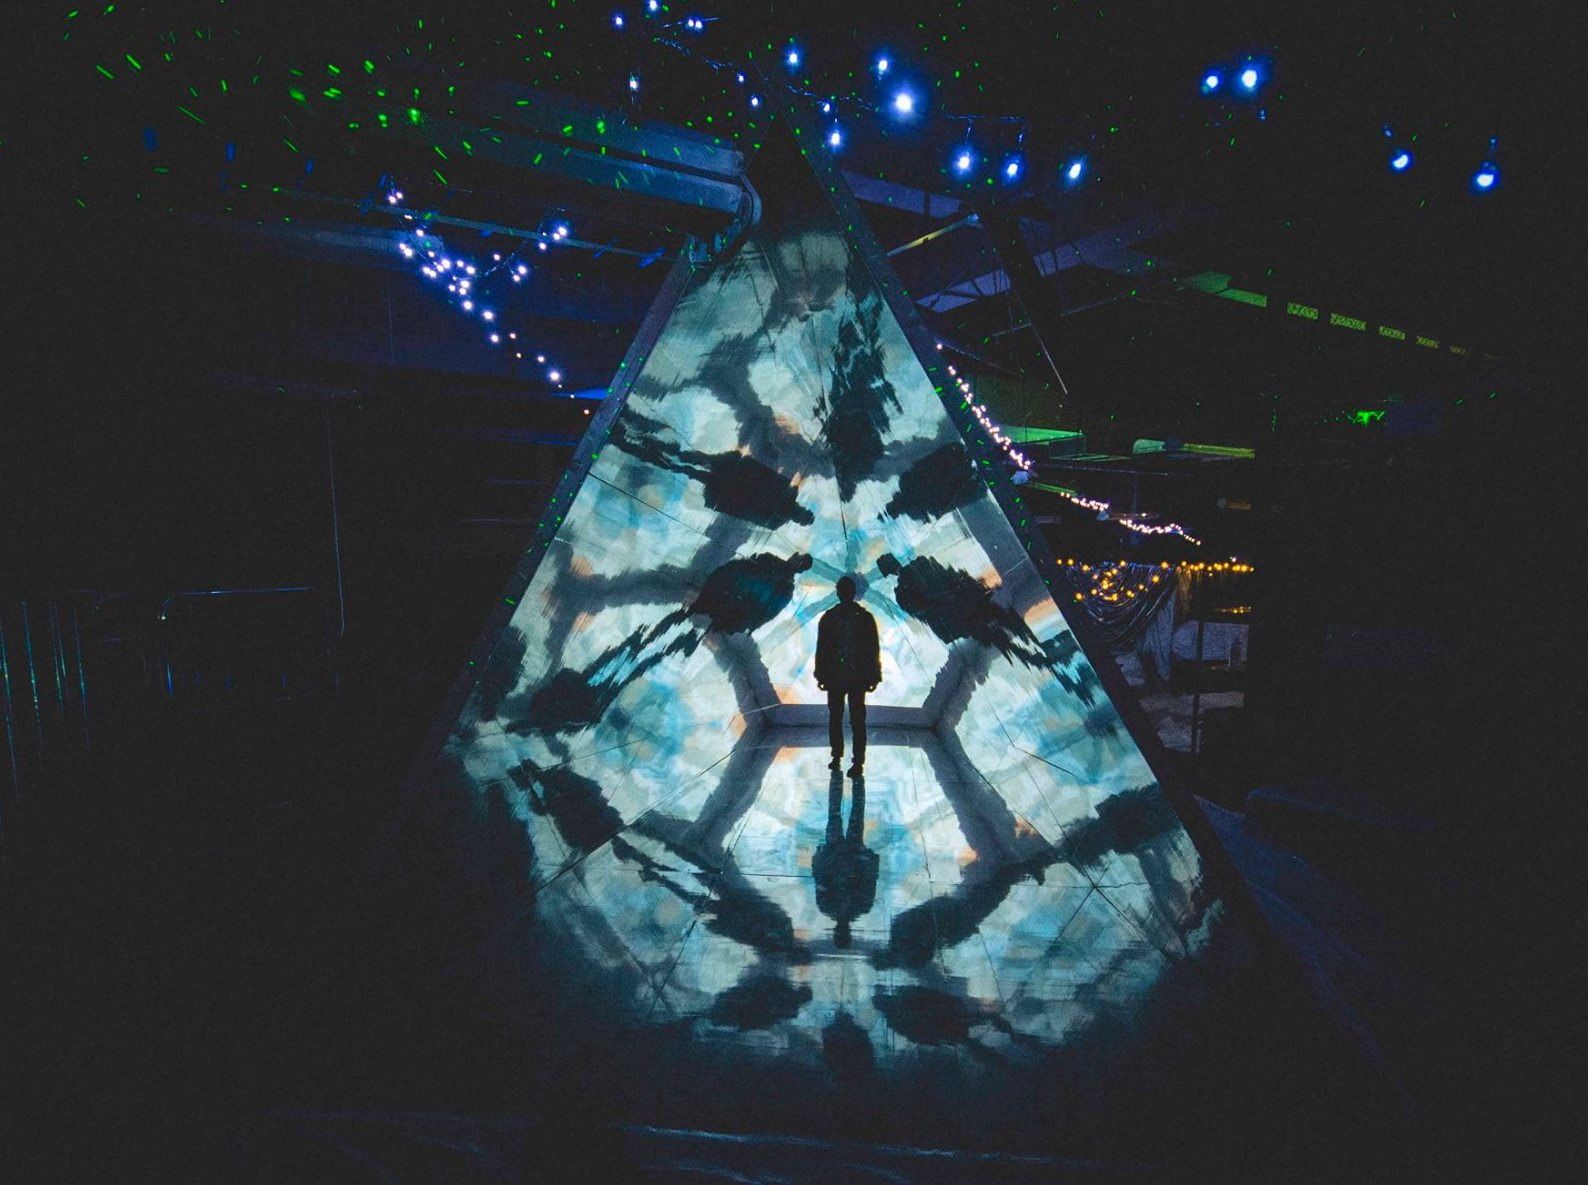 the walk-through kaleidoscope